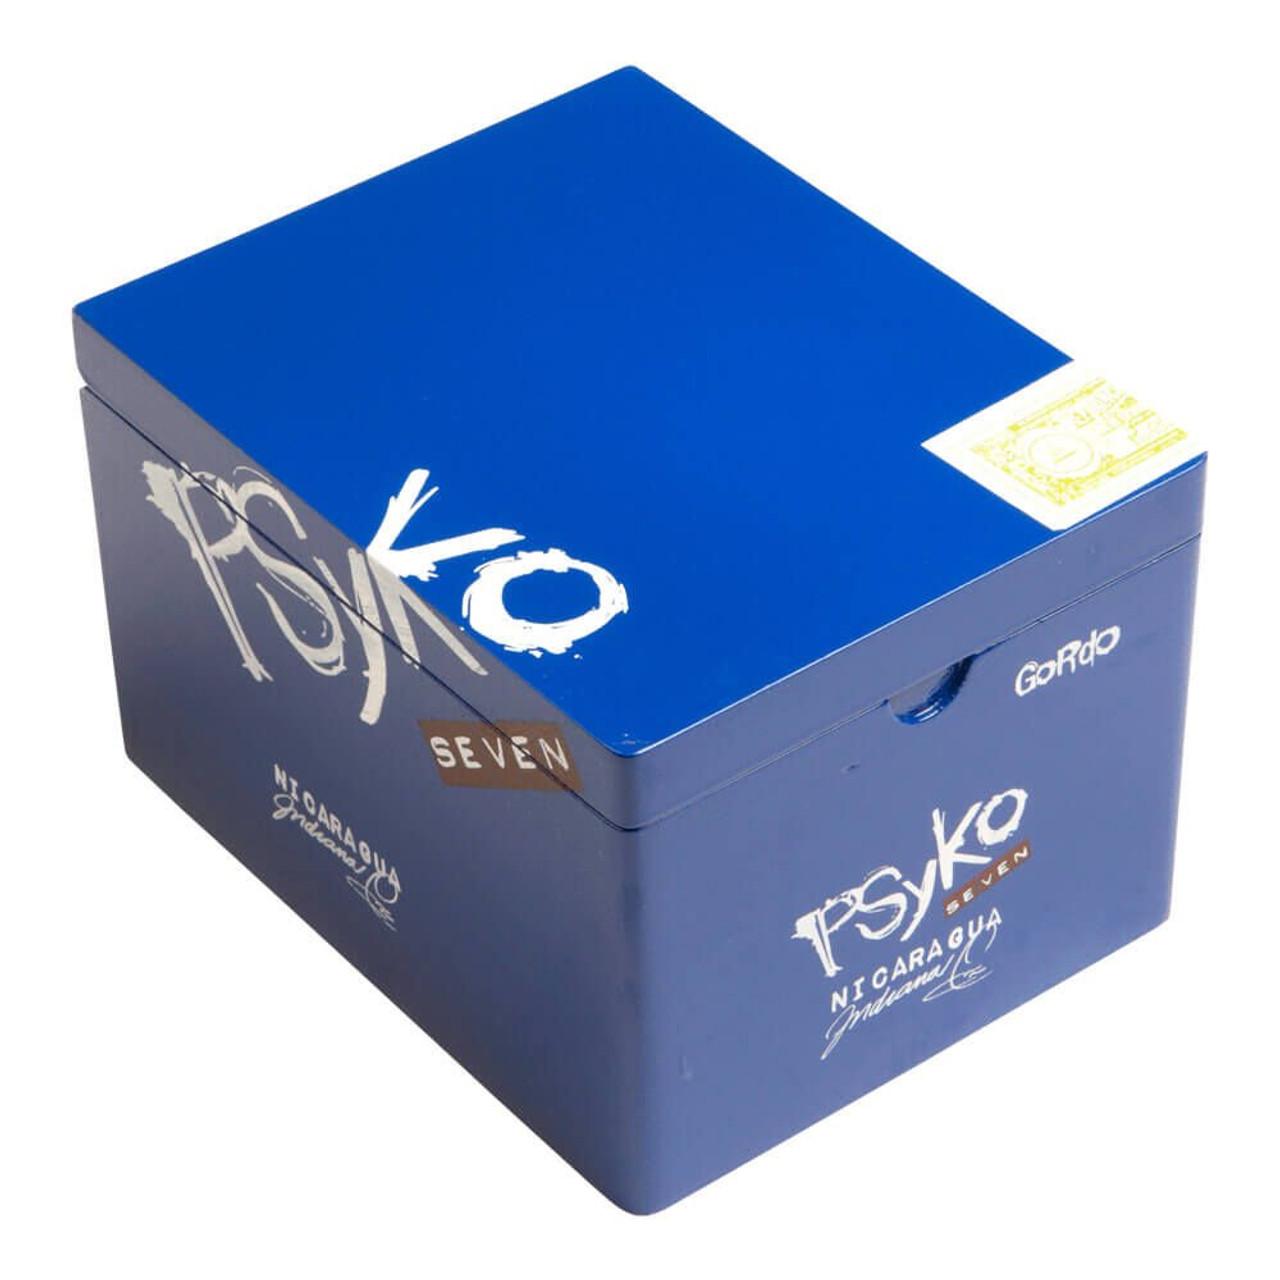 Psyko Seven Nicaragua Robusto Cigars - 5 x 50 (Box of 20)